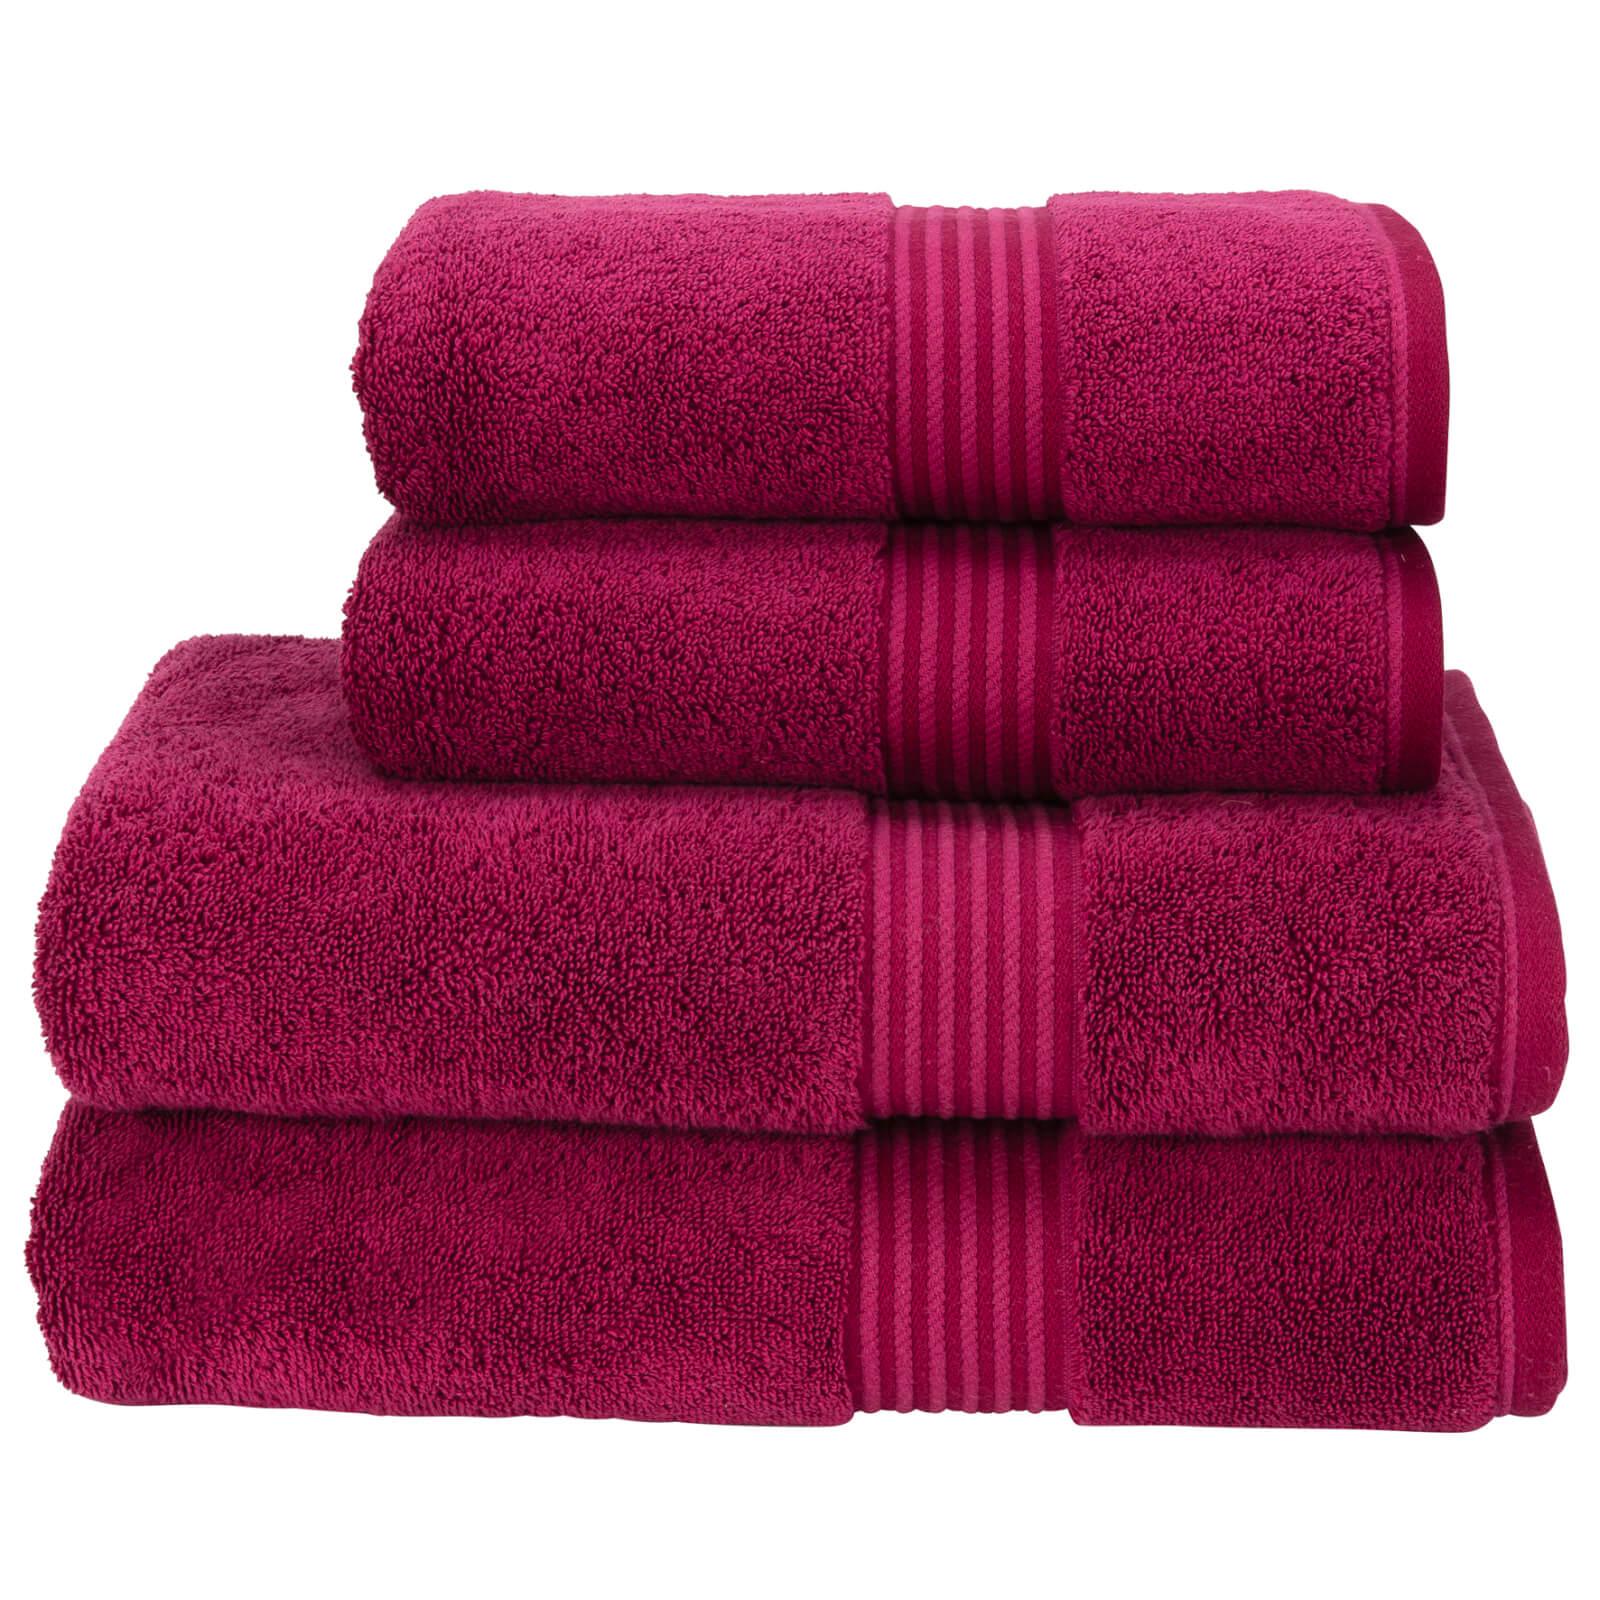 Christy Supreme Hygro Towel Range - Raspberry - Bath Sheet (Set of 2) - Pink